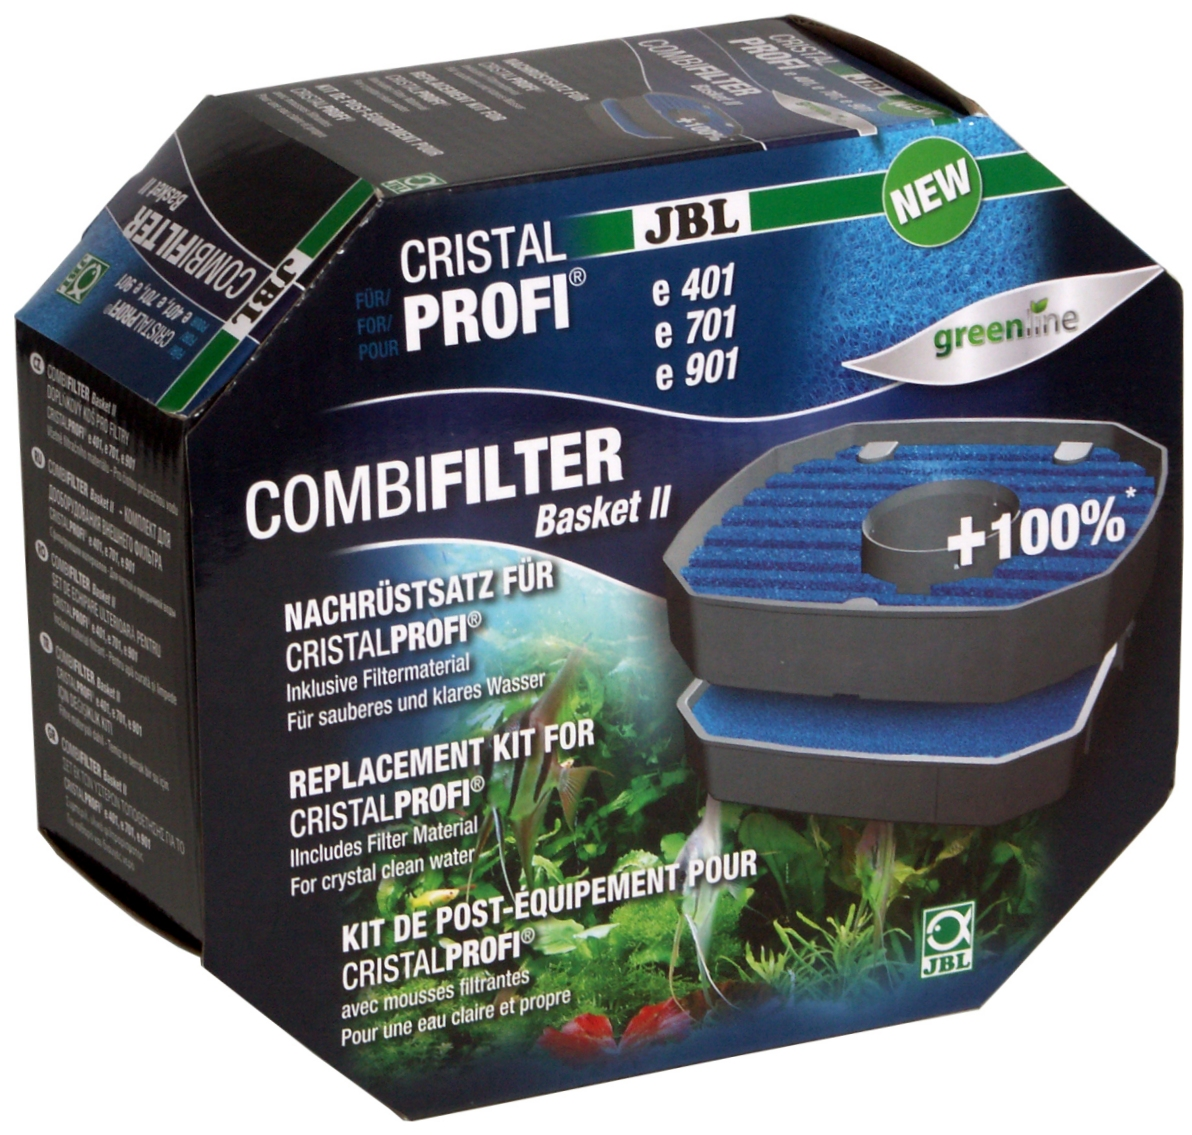 JBL CP e1501,2 Impeller-Set greenline Complete spare impeller kit for JBL CristalProfi e external filters